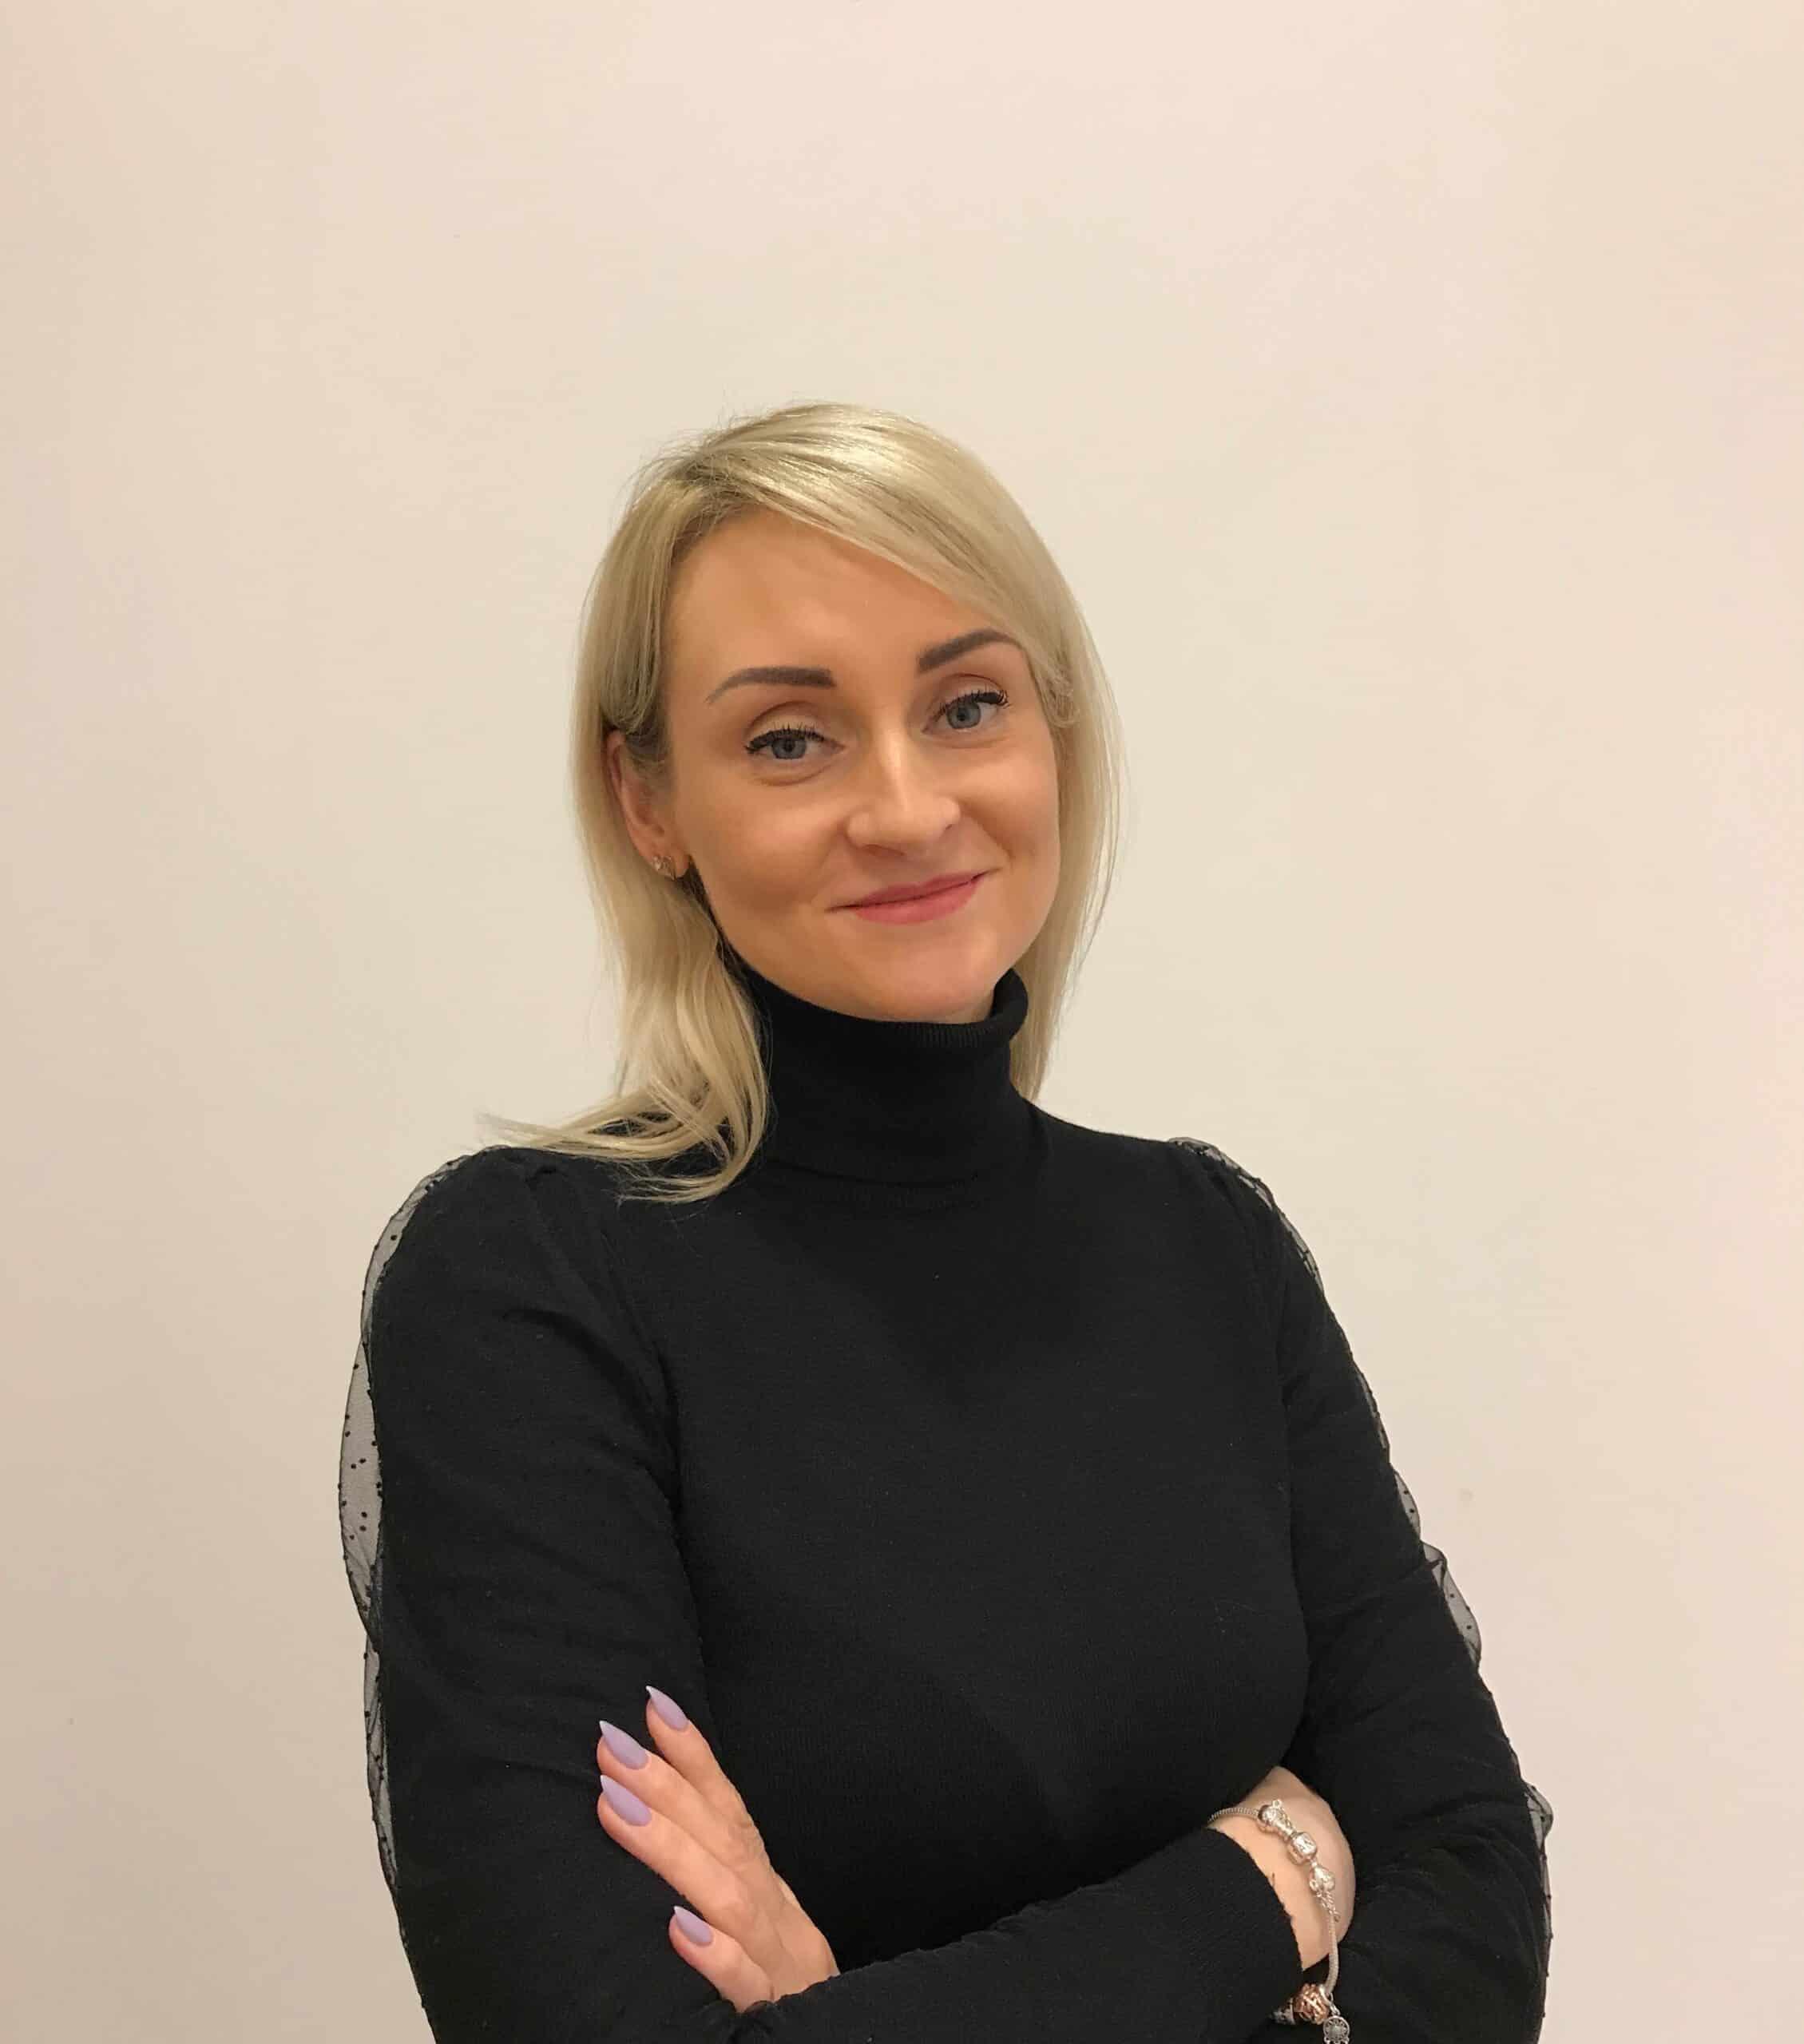 Dyrektor Natalia Zawadzka